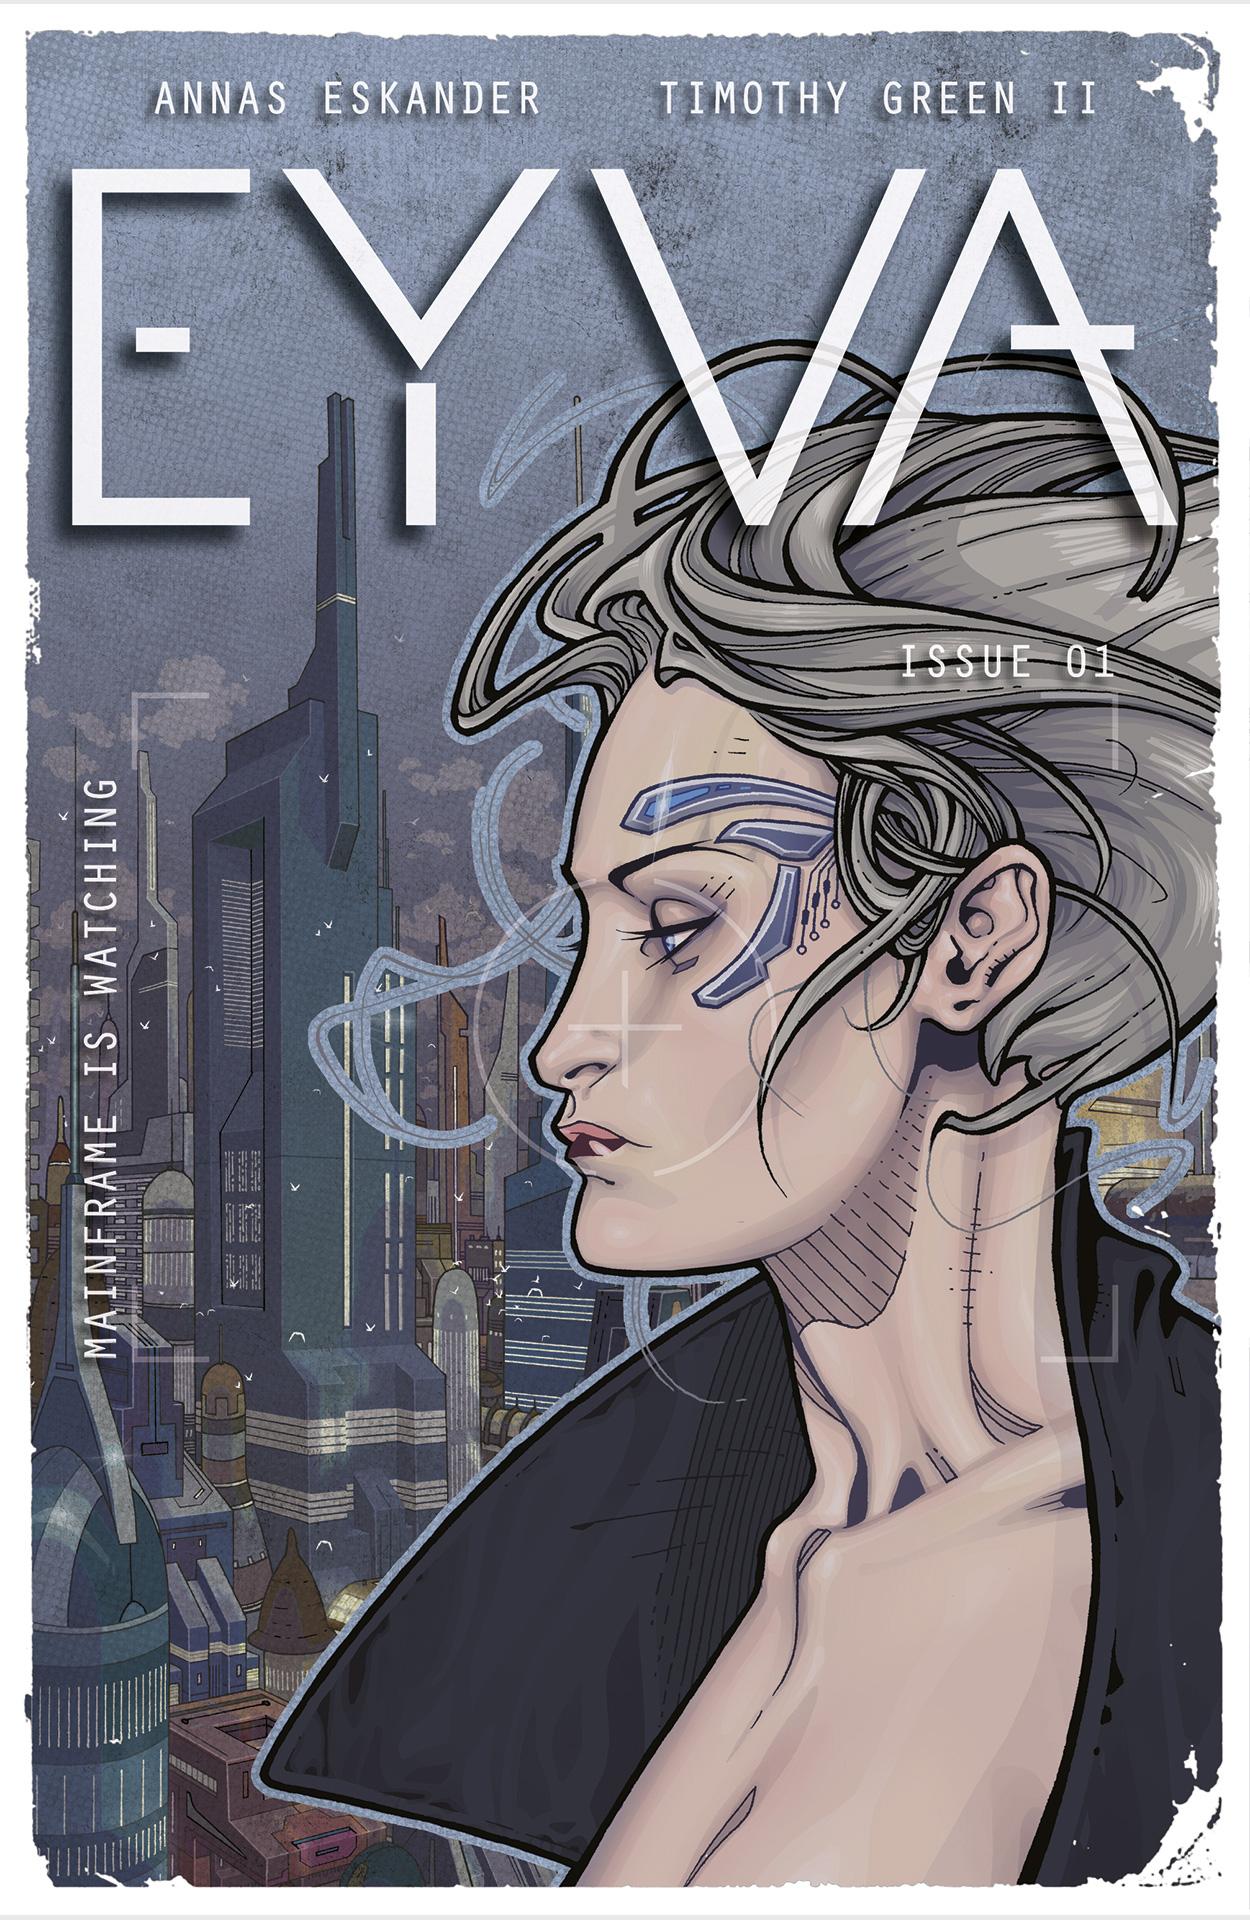 EYVA Comic Issue 1: Mainframe is Watching